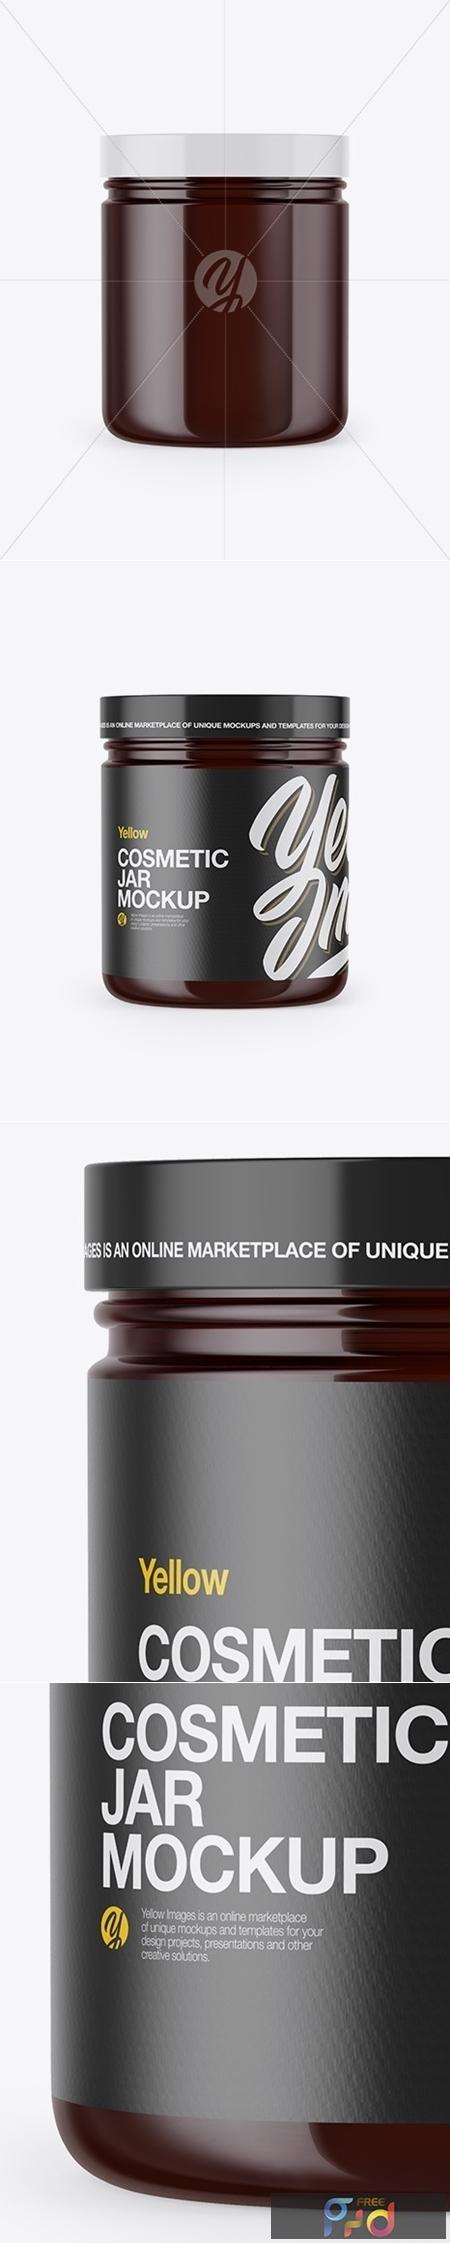 Amber Cosmetic Jar Mockup 53421 1